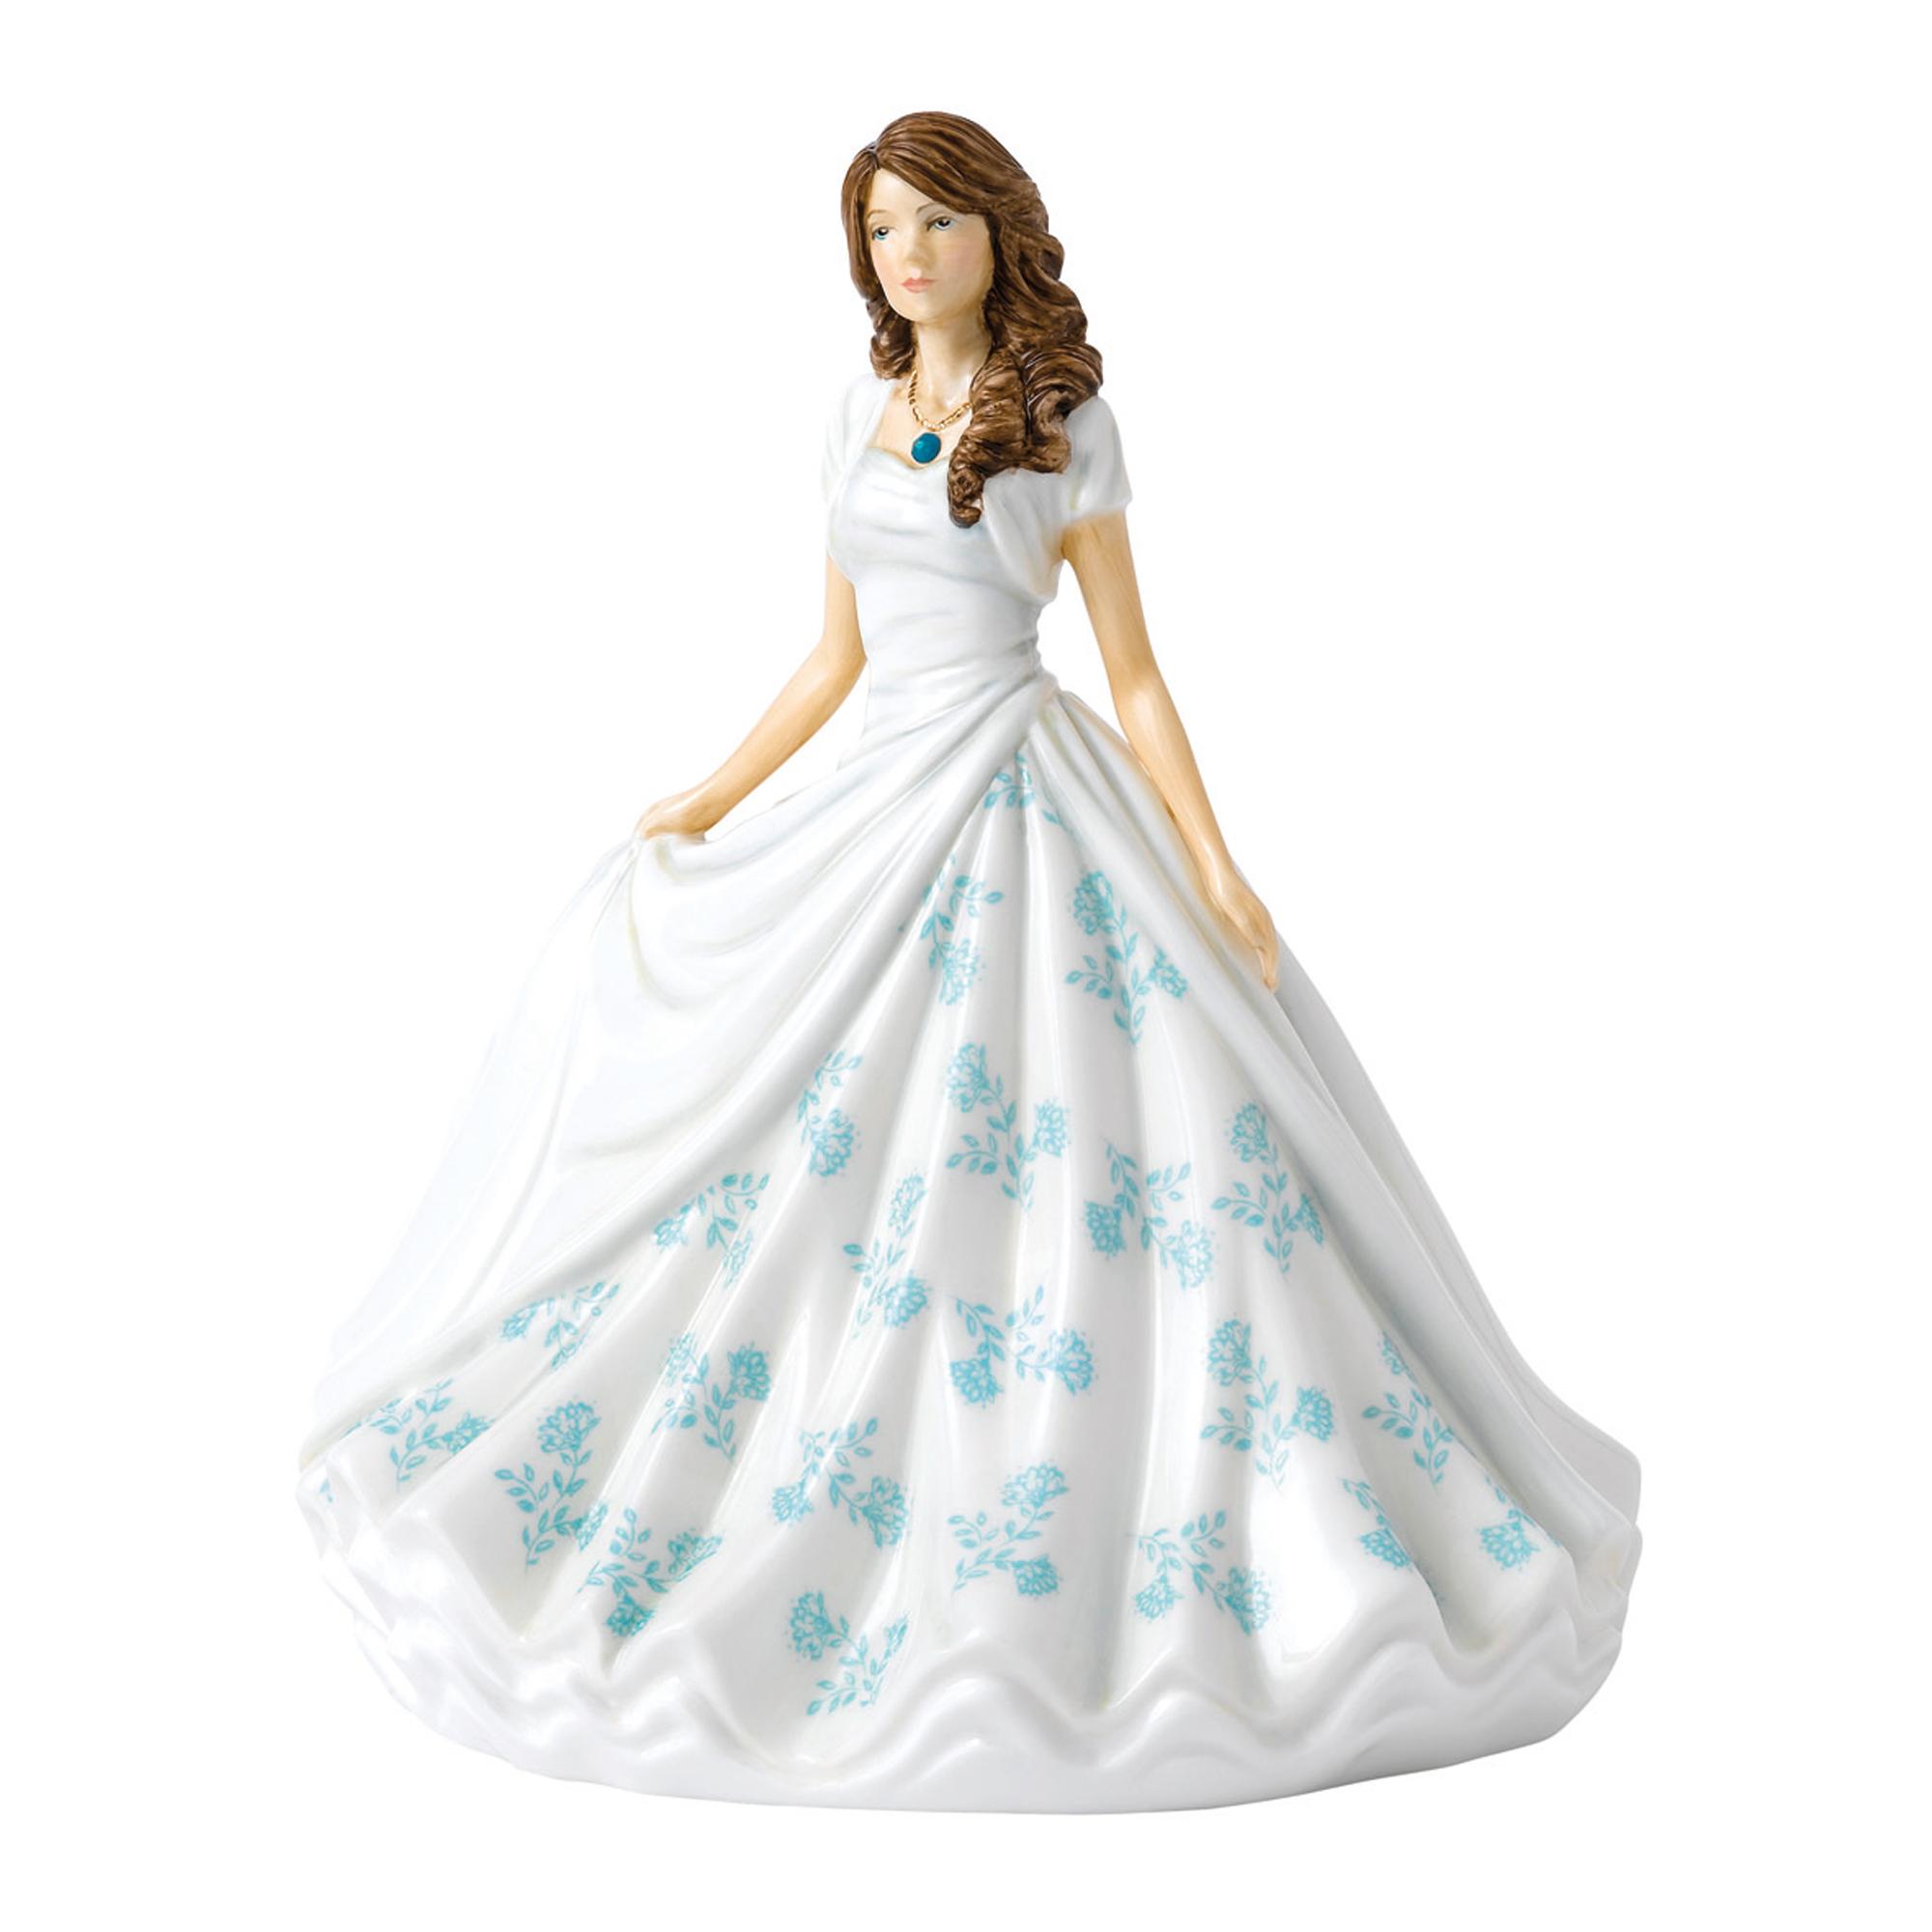 December (Turquoise) HN5908 Royal Doulton Figurine